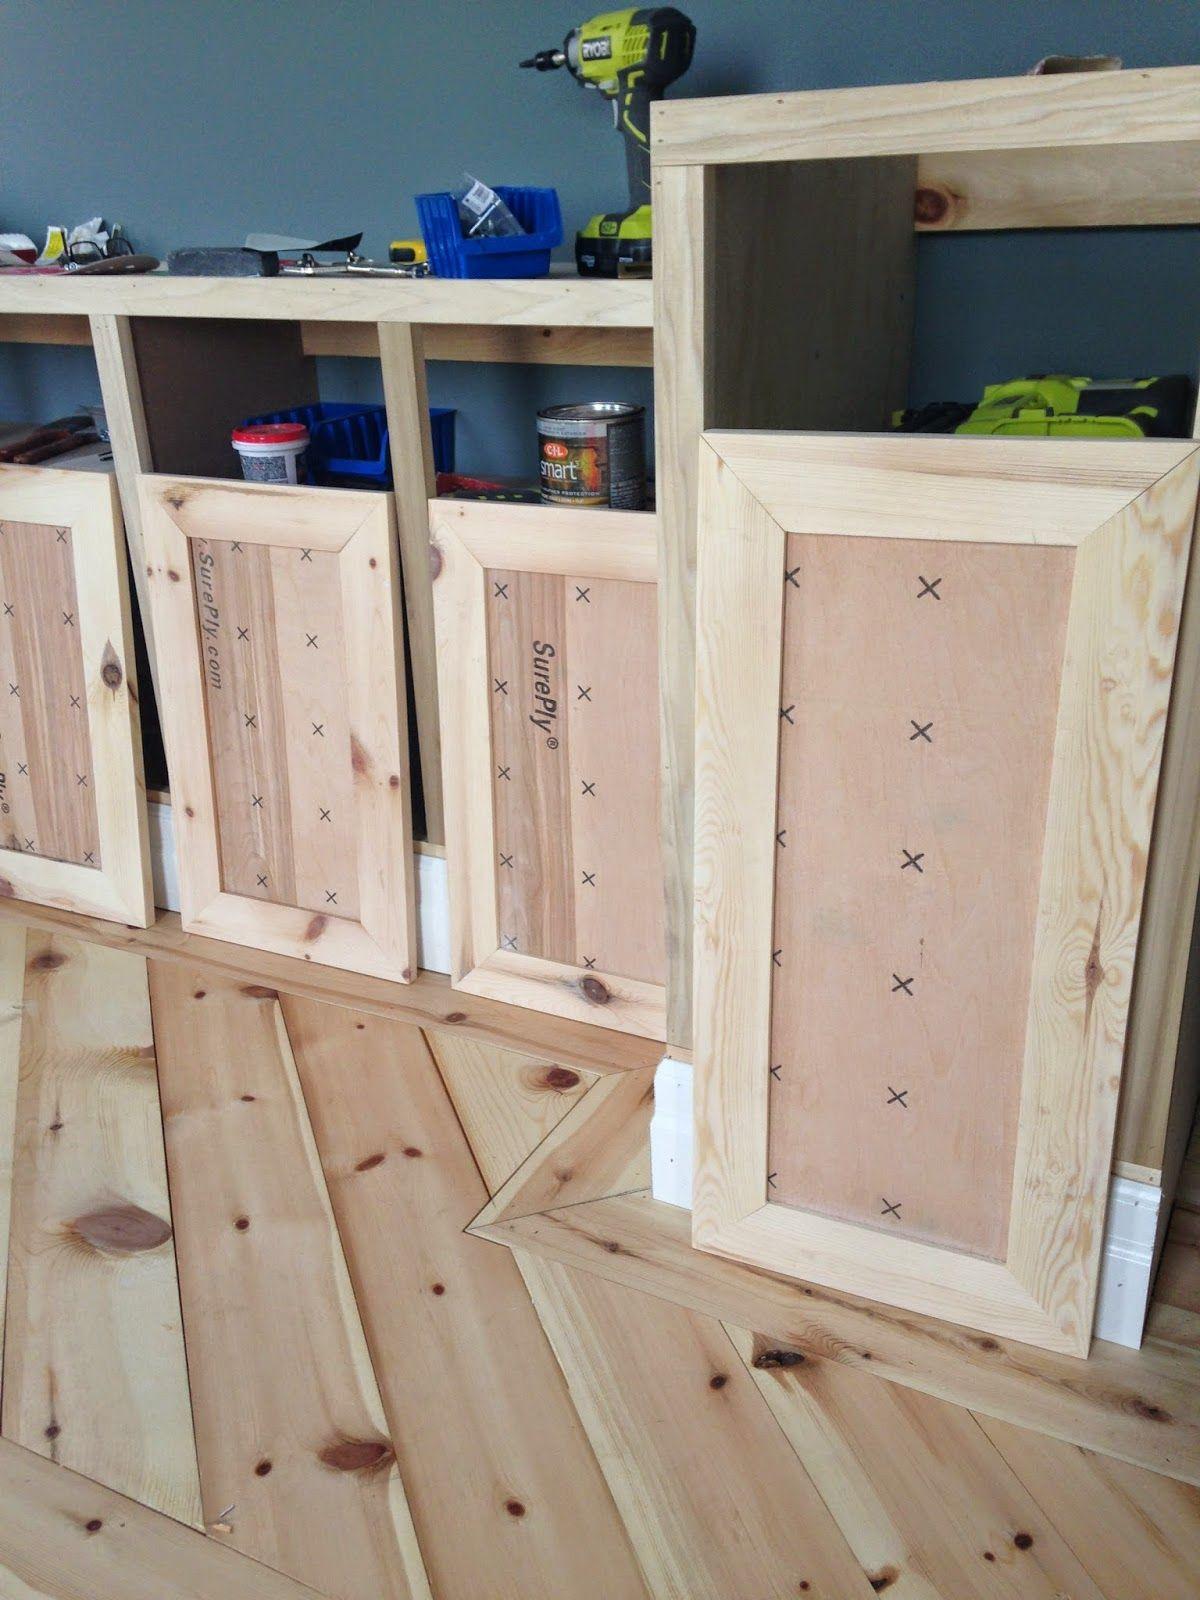 Chriskauffmanspot Diy Shaker Doors Kitchen Project